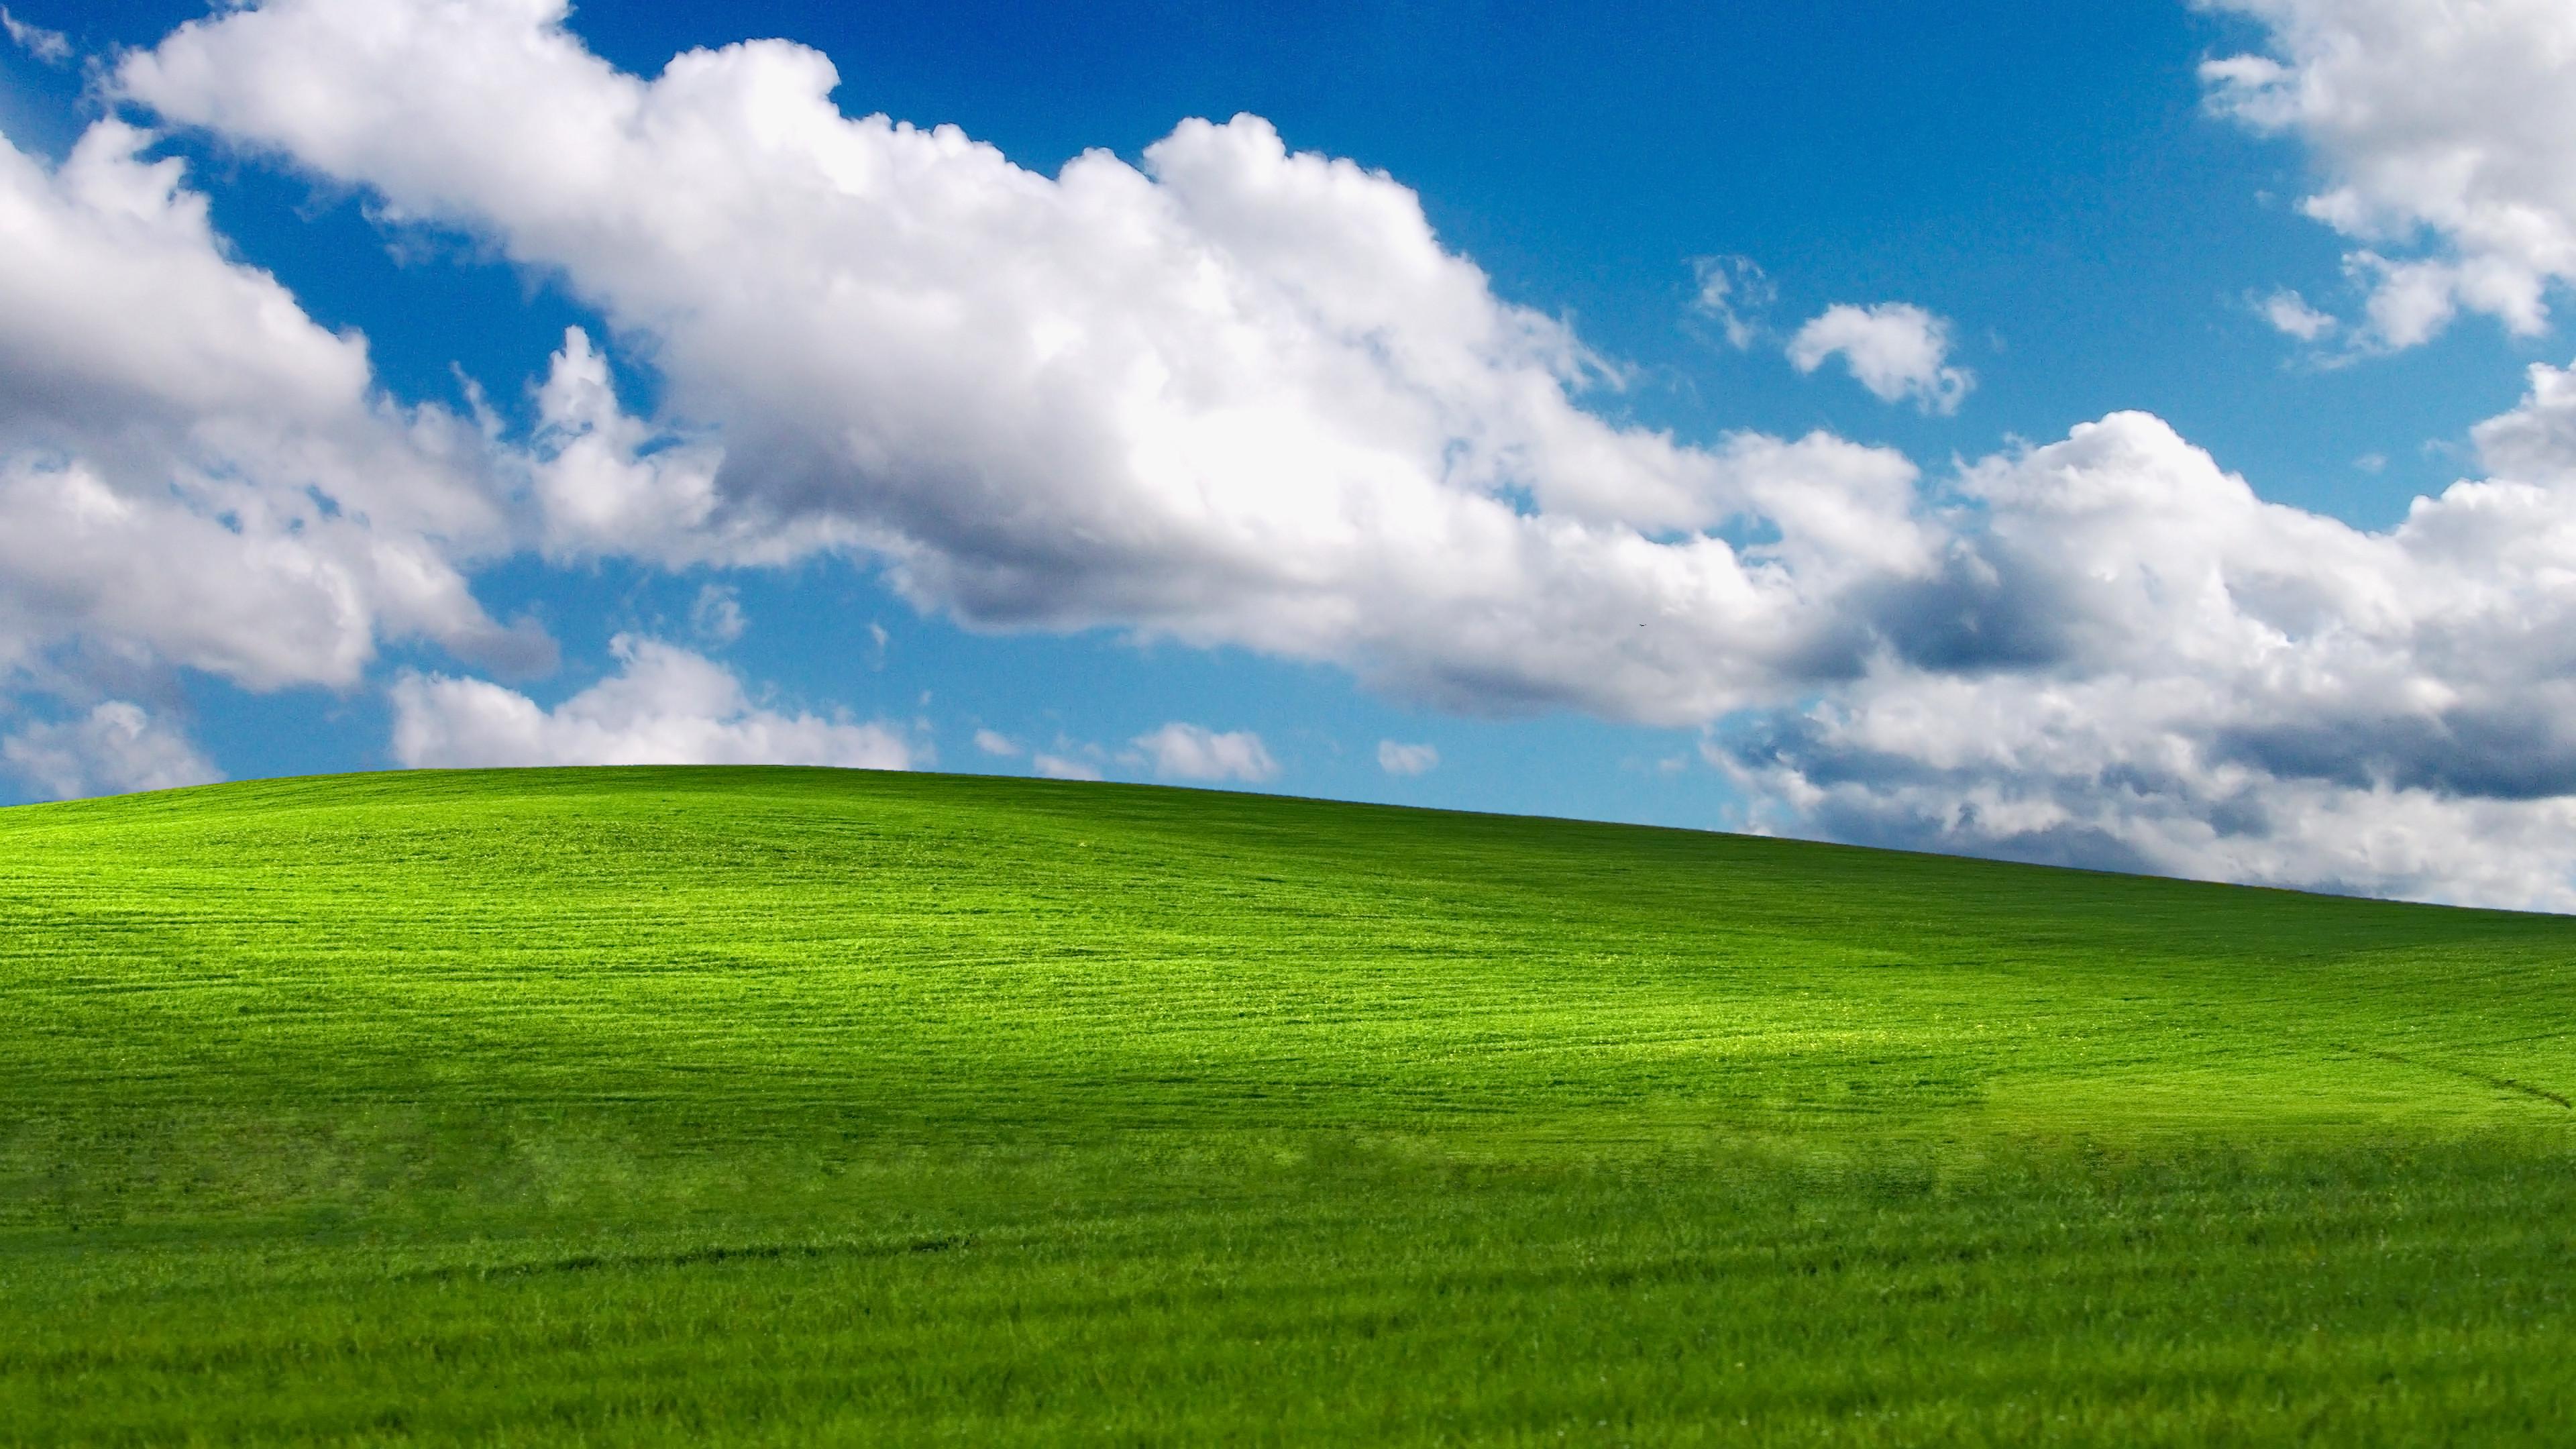 Windows xp Wallpaper HD ·① WallpaperTag